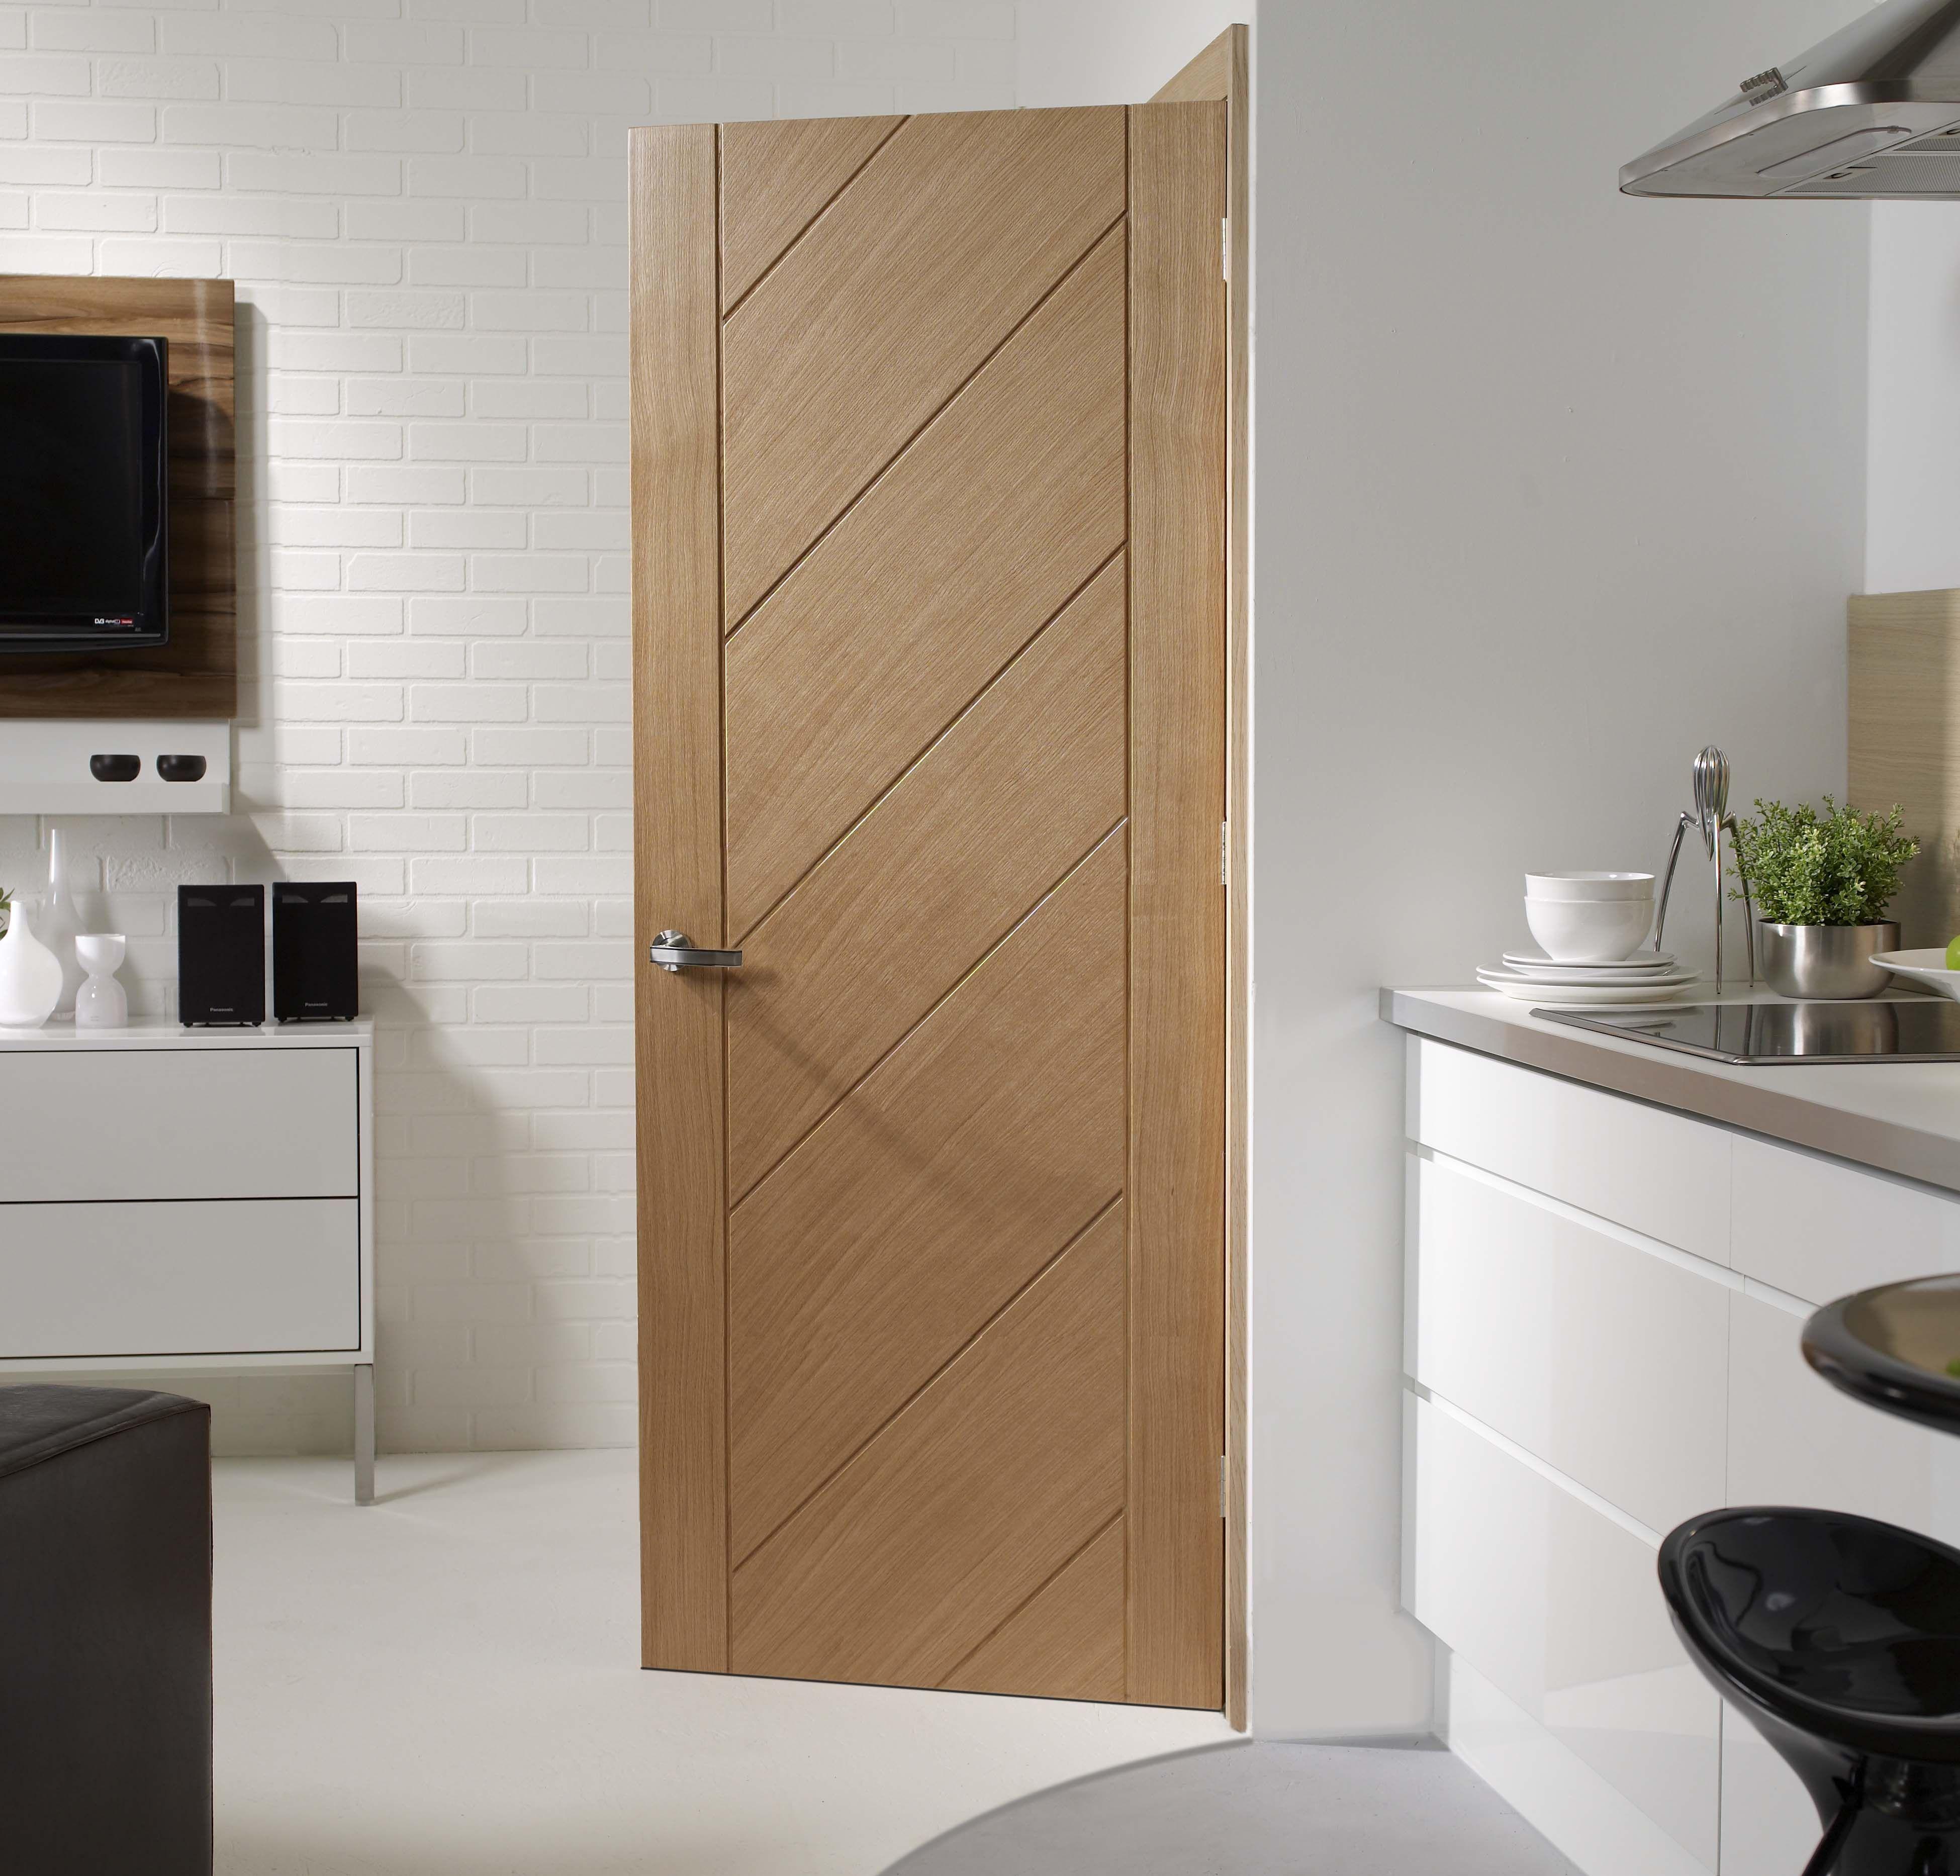 Prefinished interior doors Photo – 3